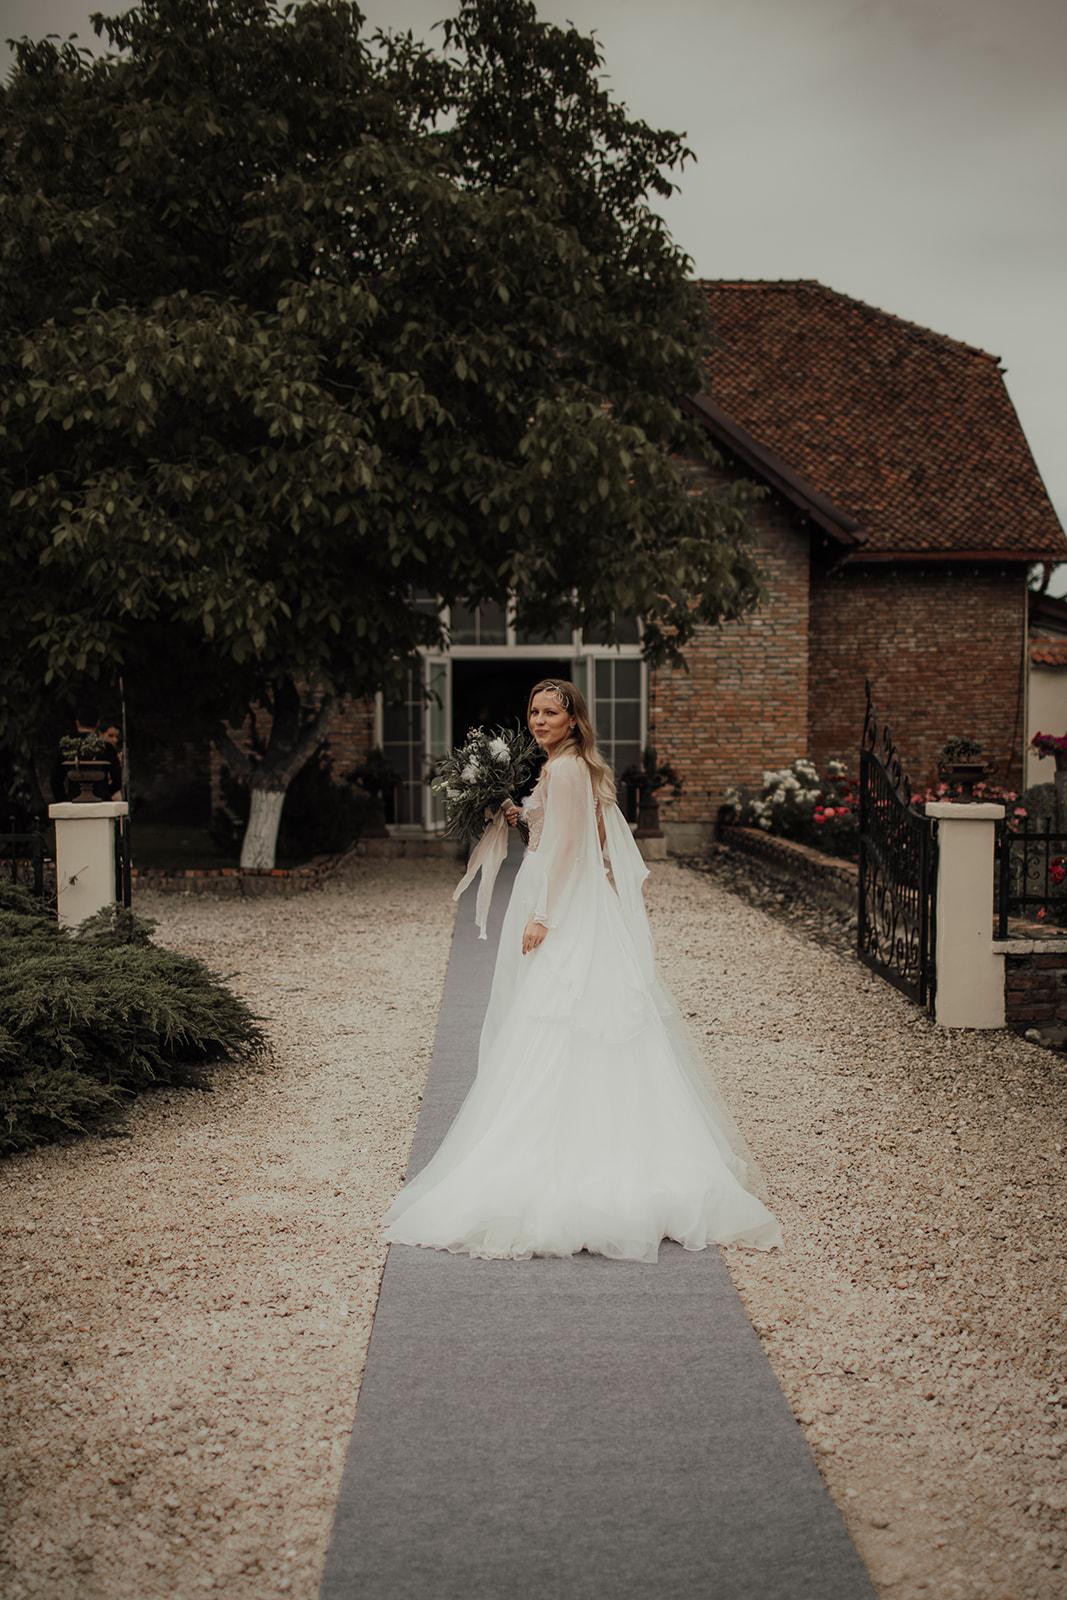 Wedding gowns - Otilia BrailoiuQuantum Clothing DesignDivine AtelierThe Bride by Oana LupasPronoviasGrace Loves LaceReclamationRue de Seine